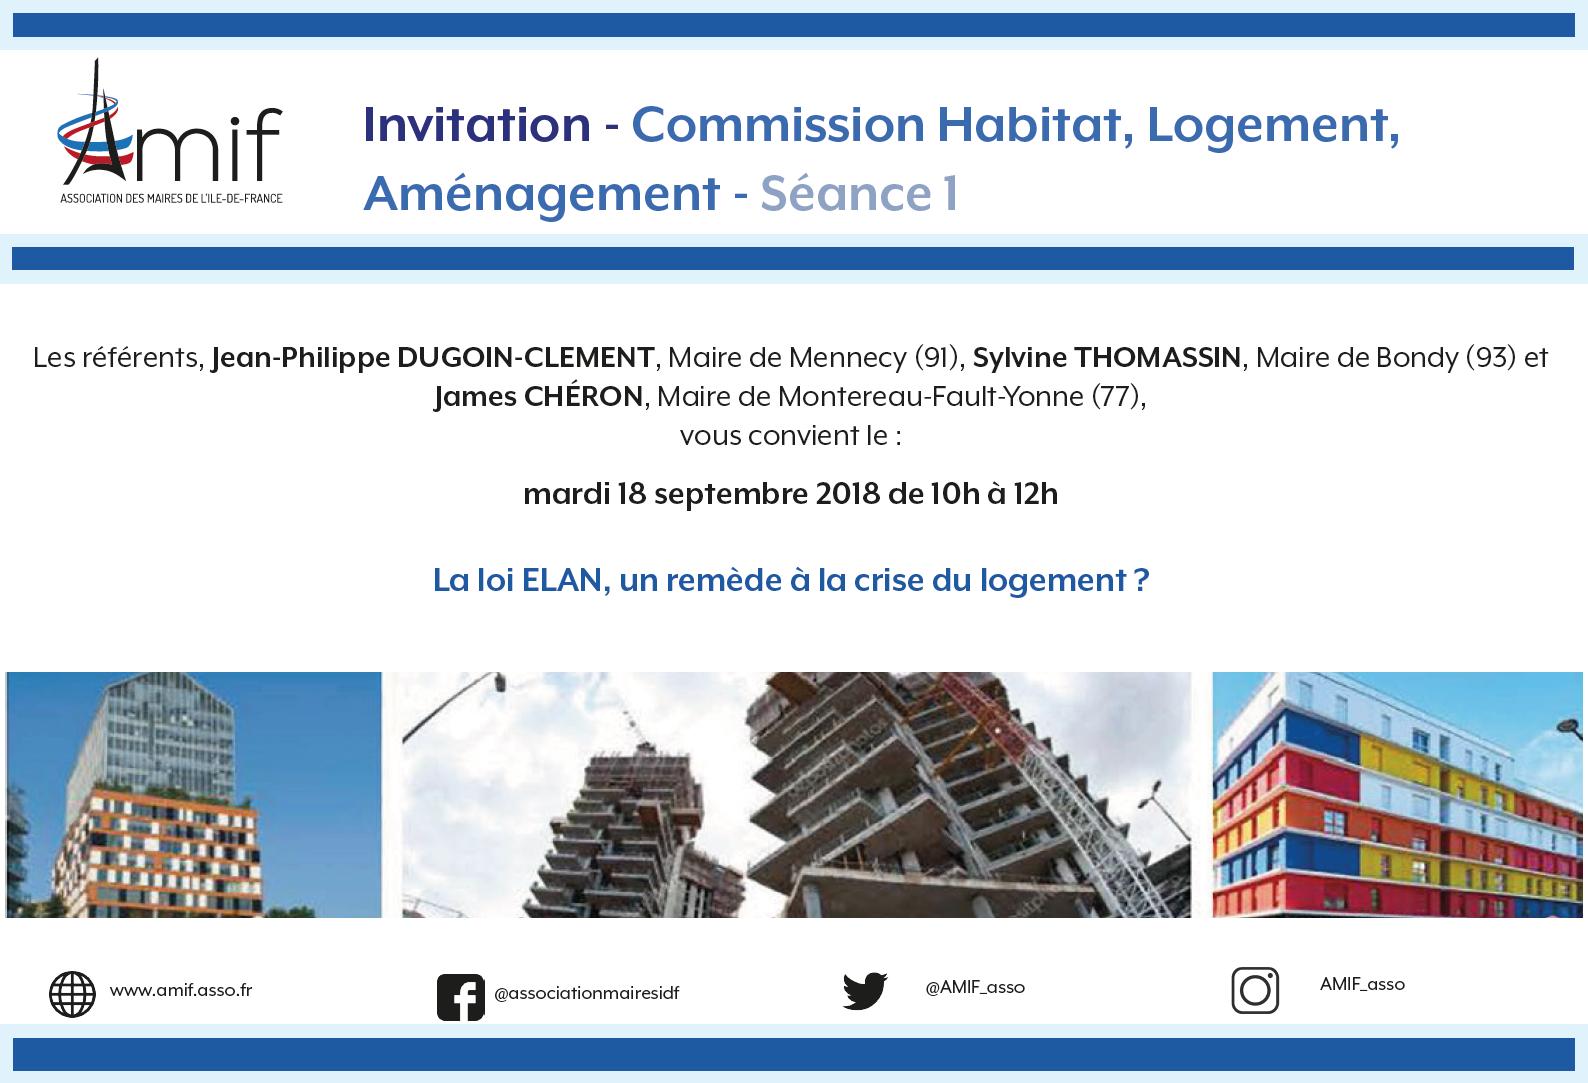 CommissionHabitatLogementAmenagementSeance118septembre2018v2